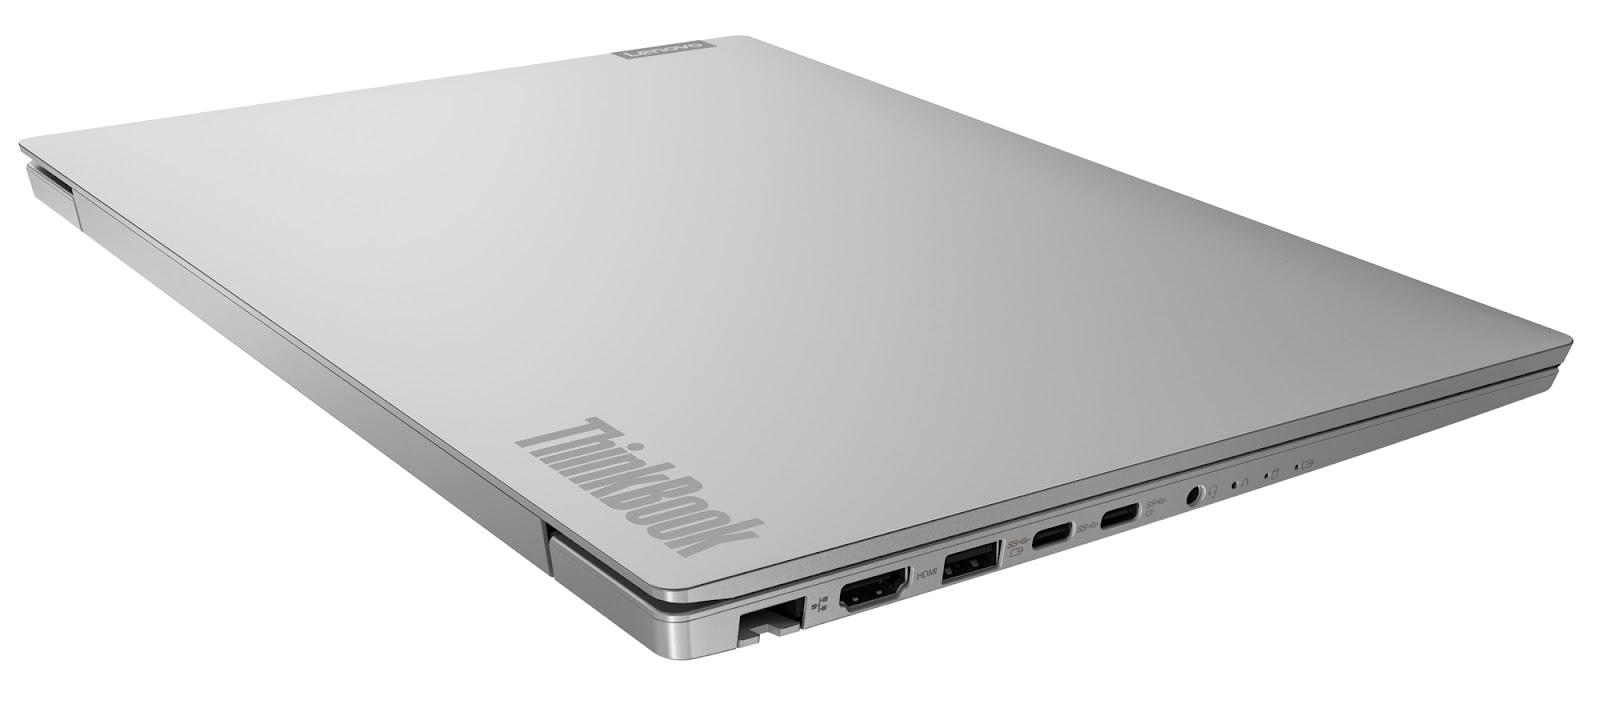 Фото 3. Ноутбук Lenovo ThinkBook 14-IIL (20SL002YRU)